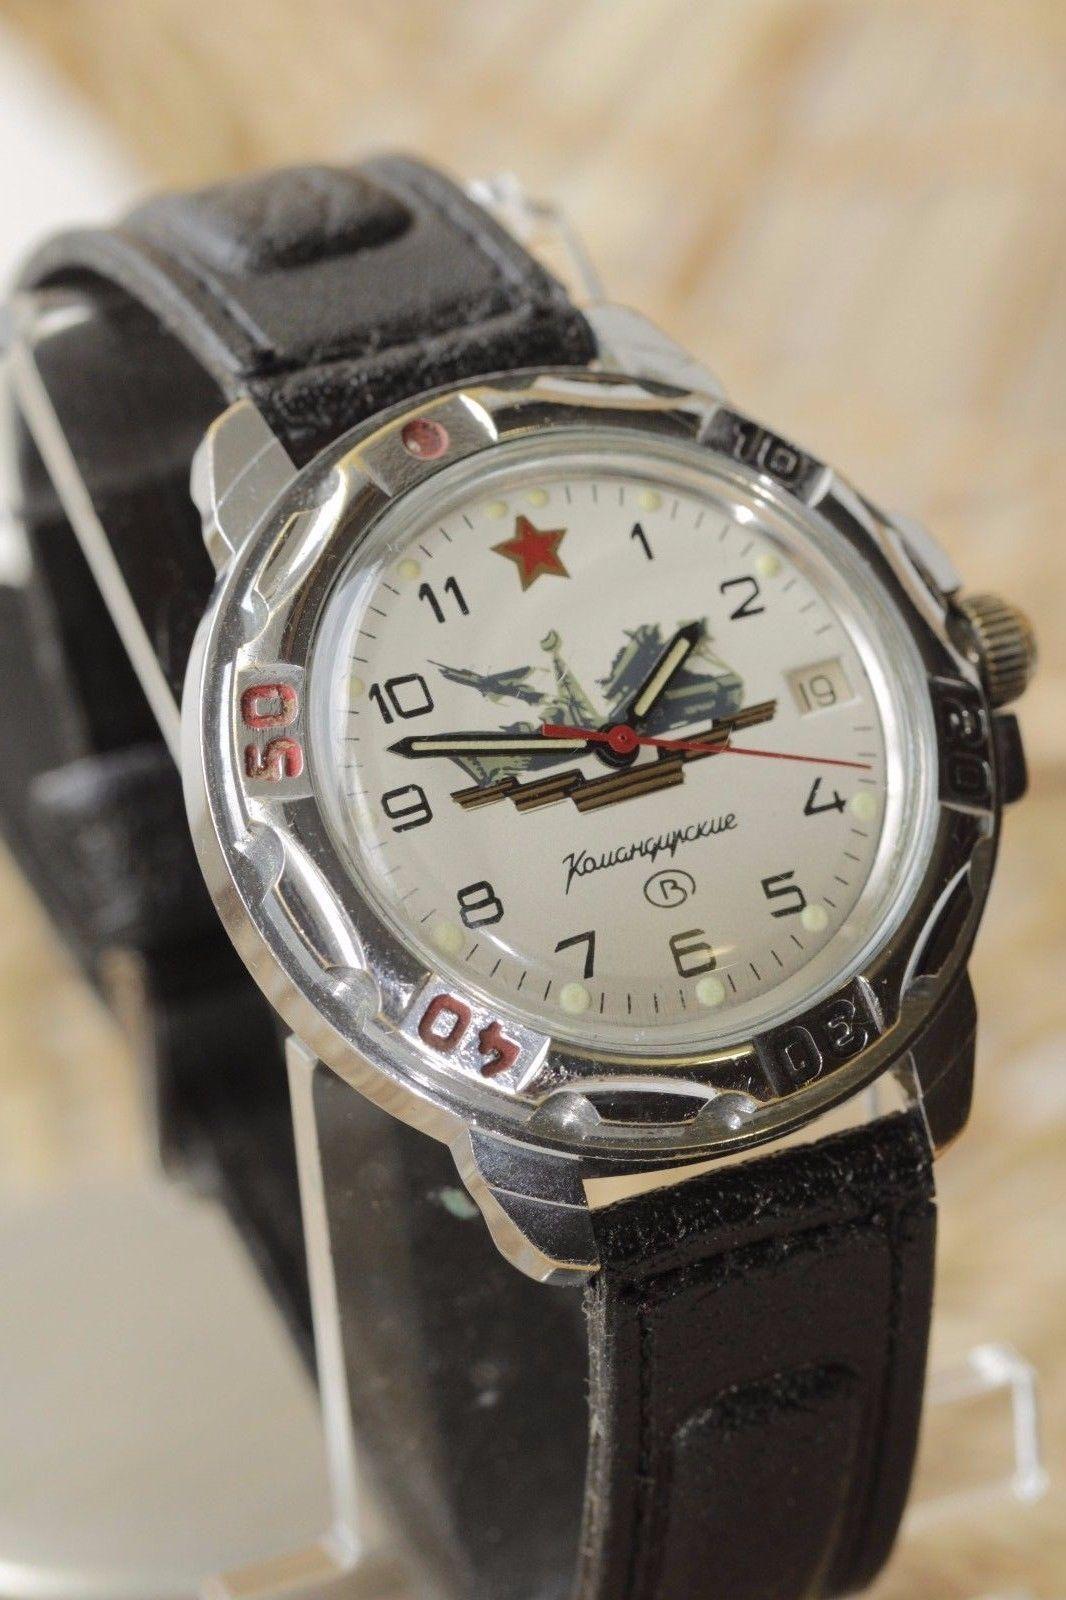 f8ef37b5dcc0 Details about VOSTOK KOMANDIRSKIE MECHANICAL Wrist Watch made in ...